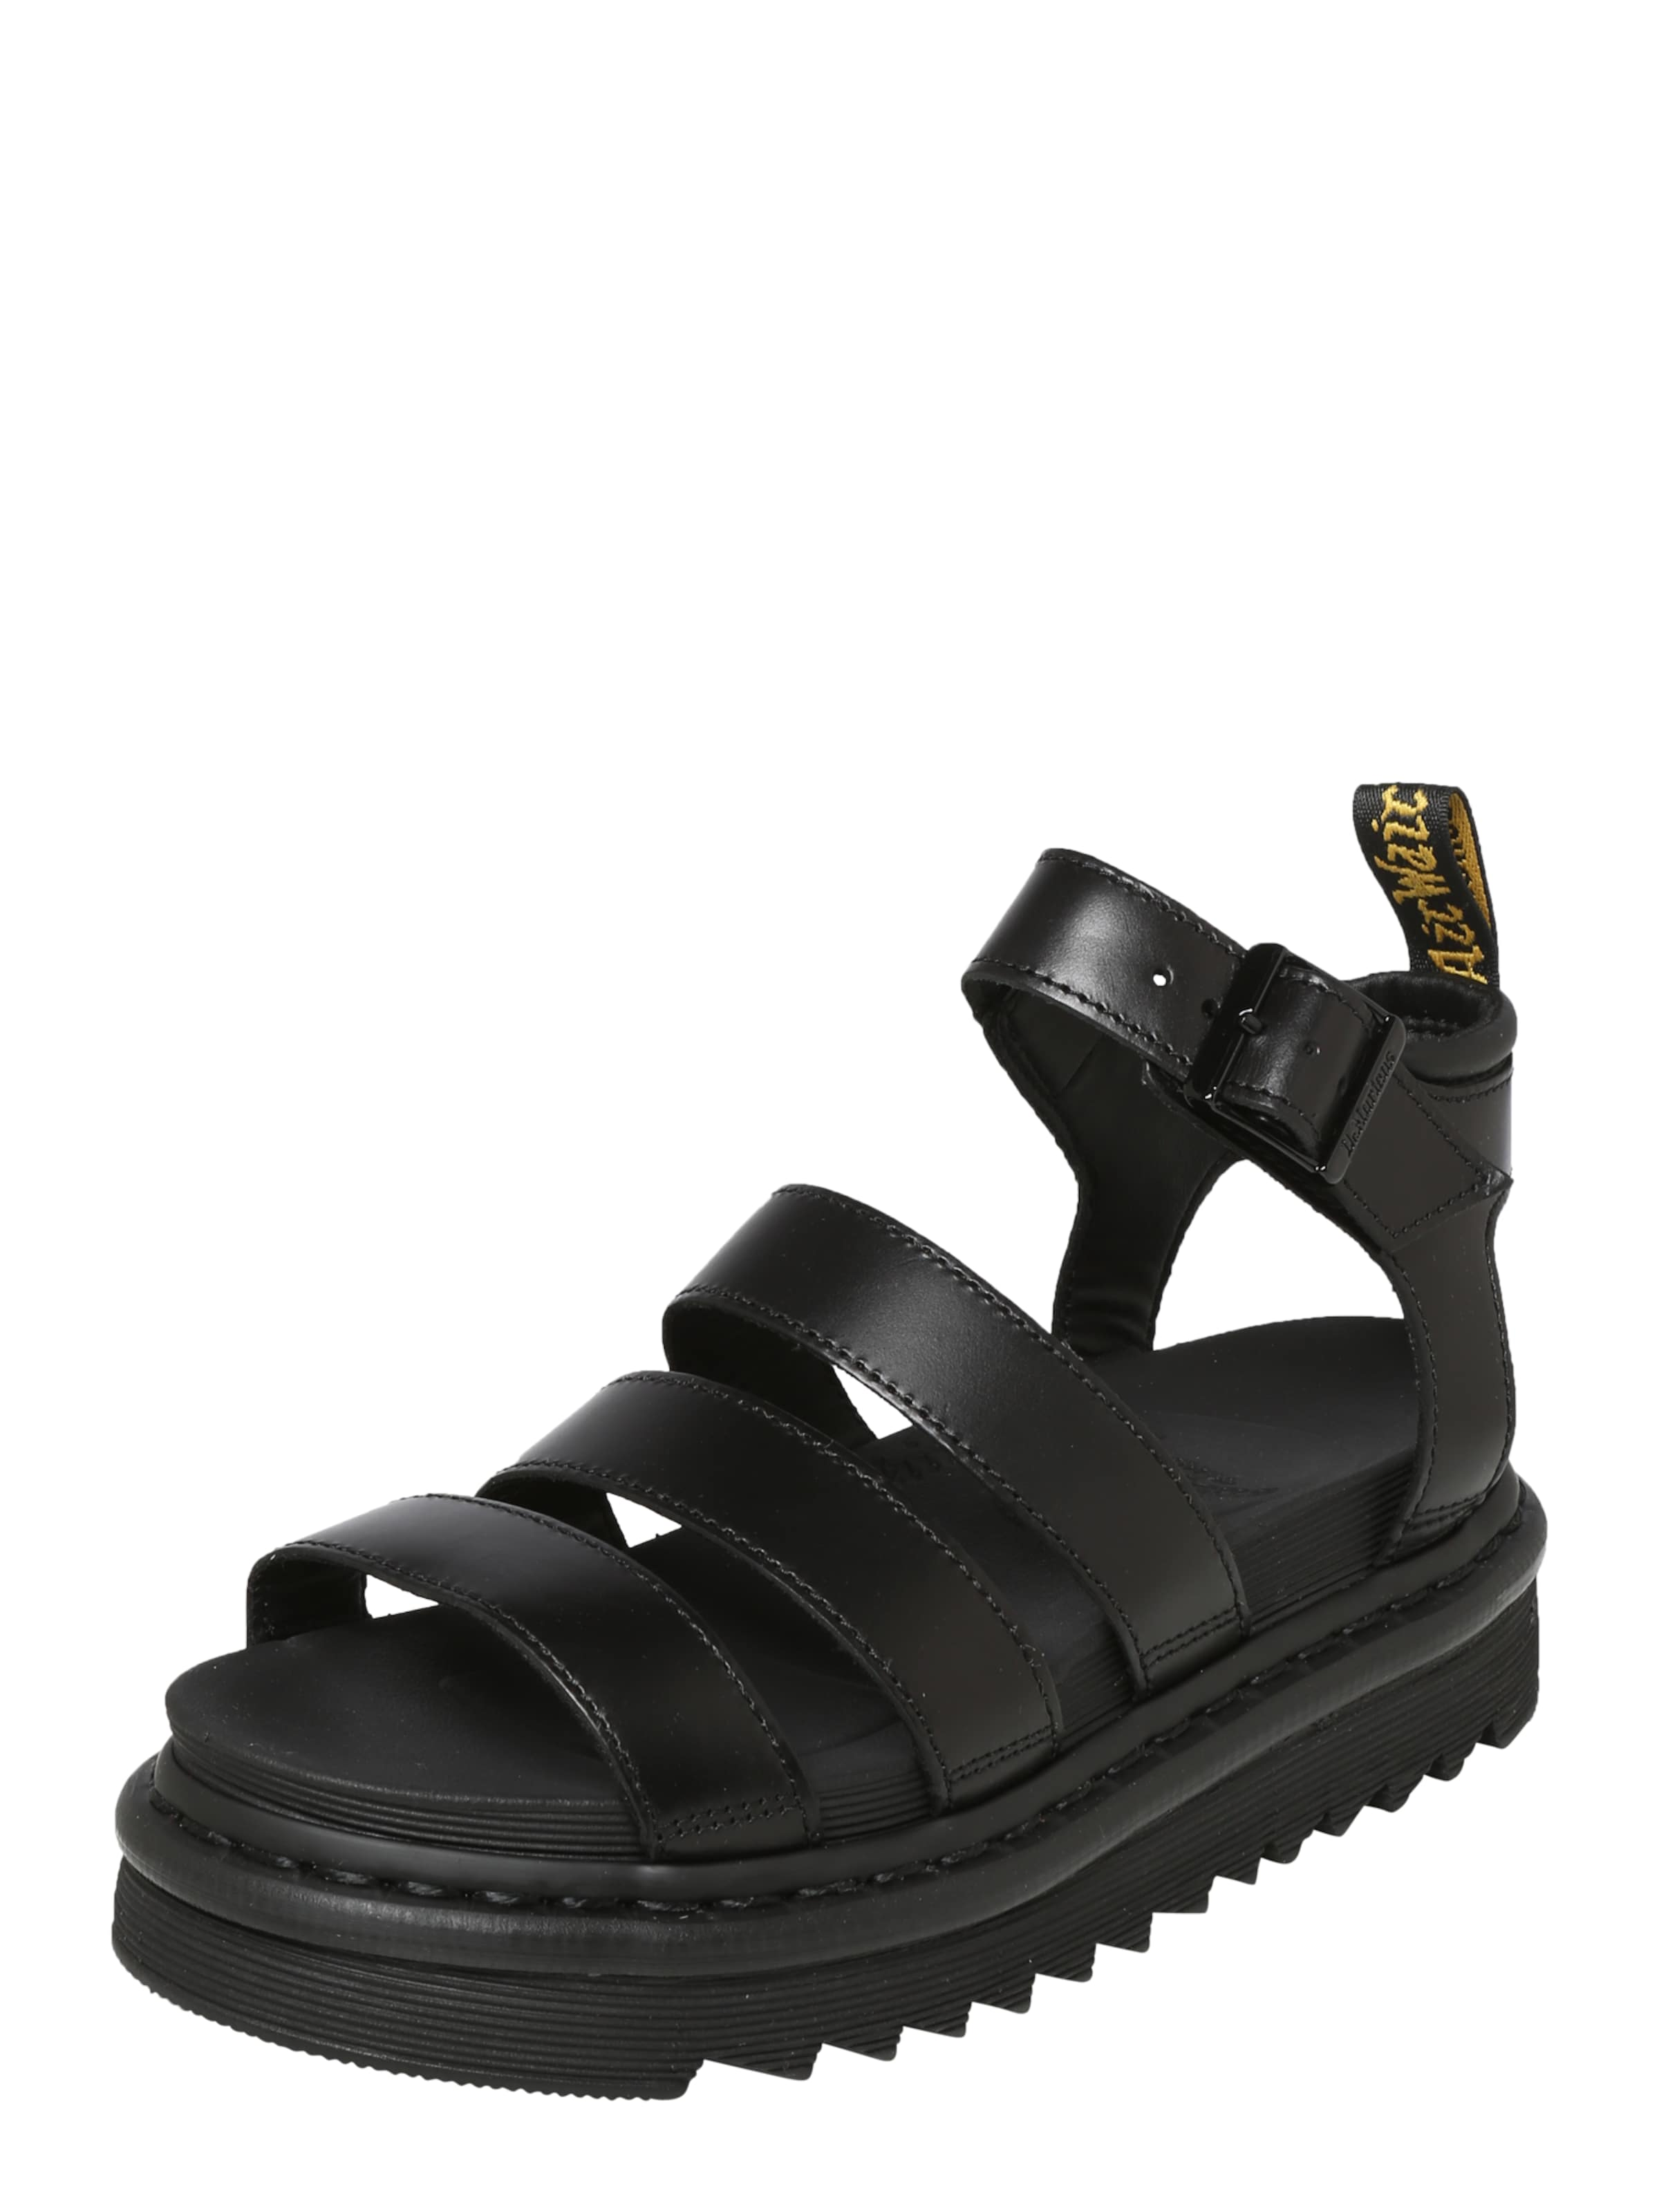 Sandale DrMartens Blaire' In Schwarz 'chunky j5AL3q4R